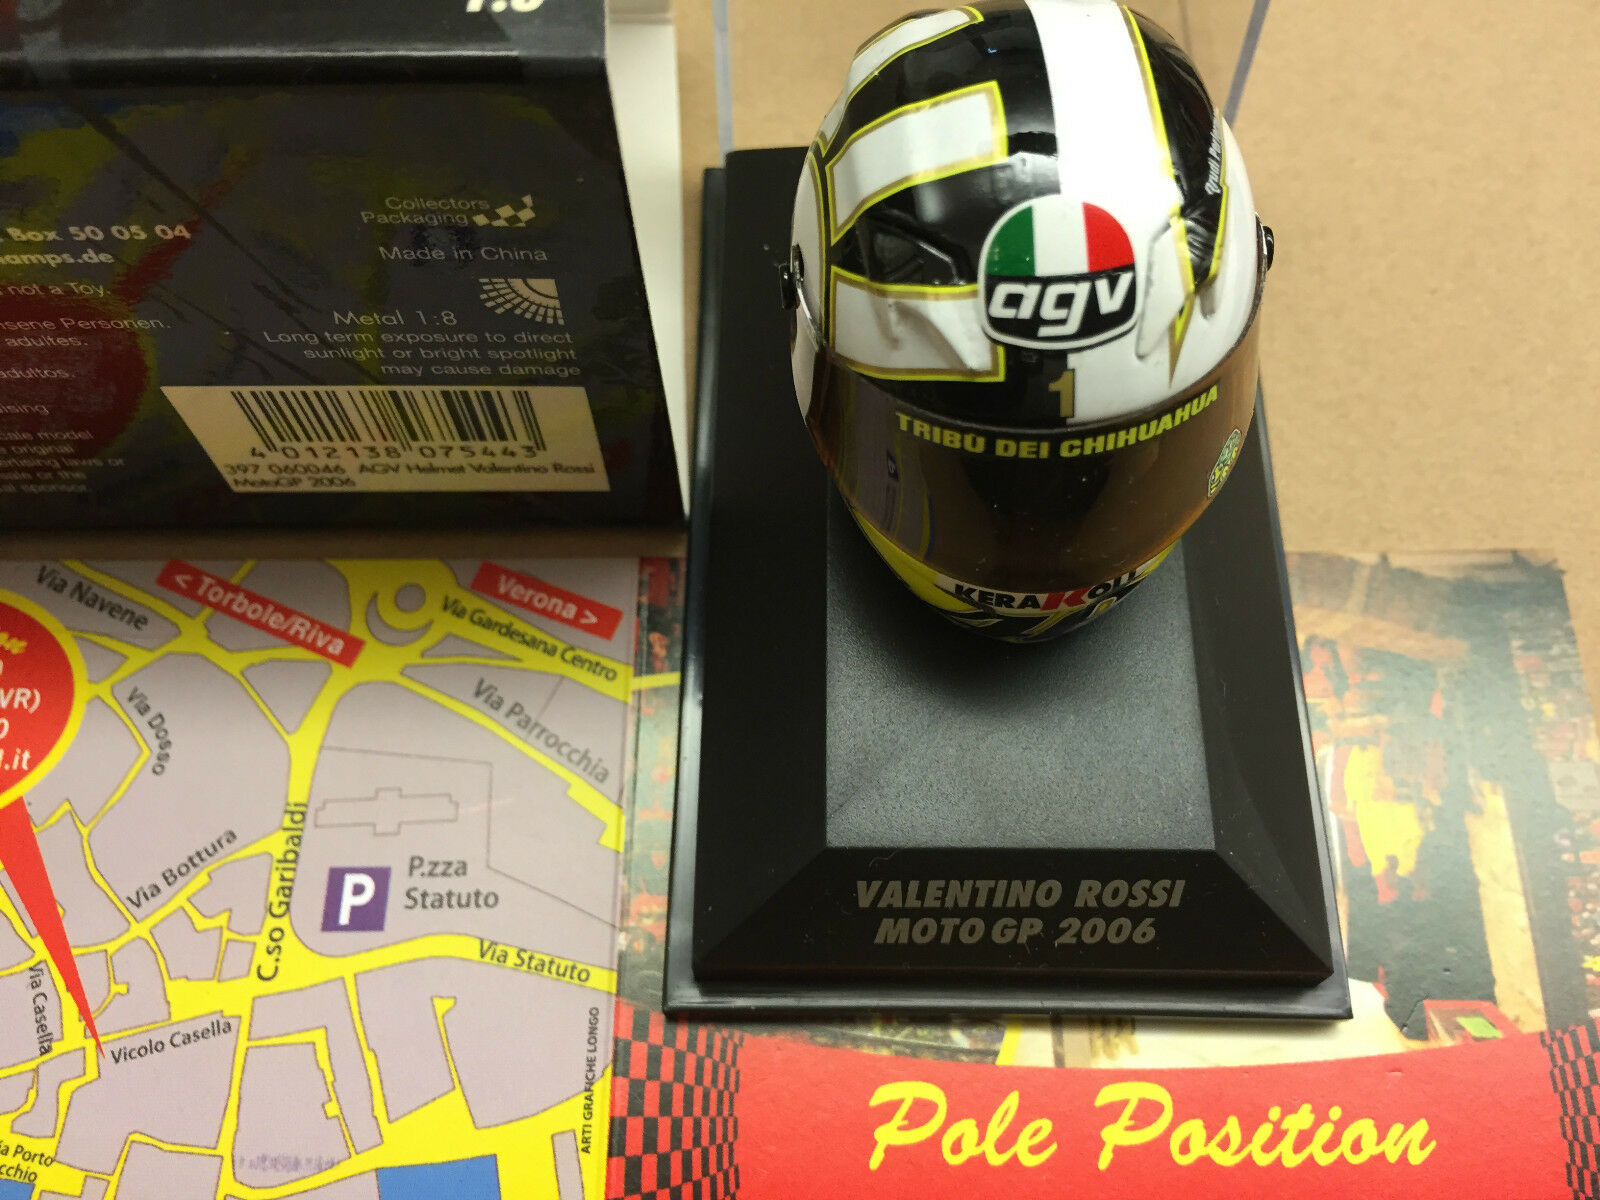 VALENTINO ROSSI CASCO HELMET MOTOGP 2006  397060046 MINICHAMPS 1 8 NEW VERY RARE